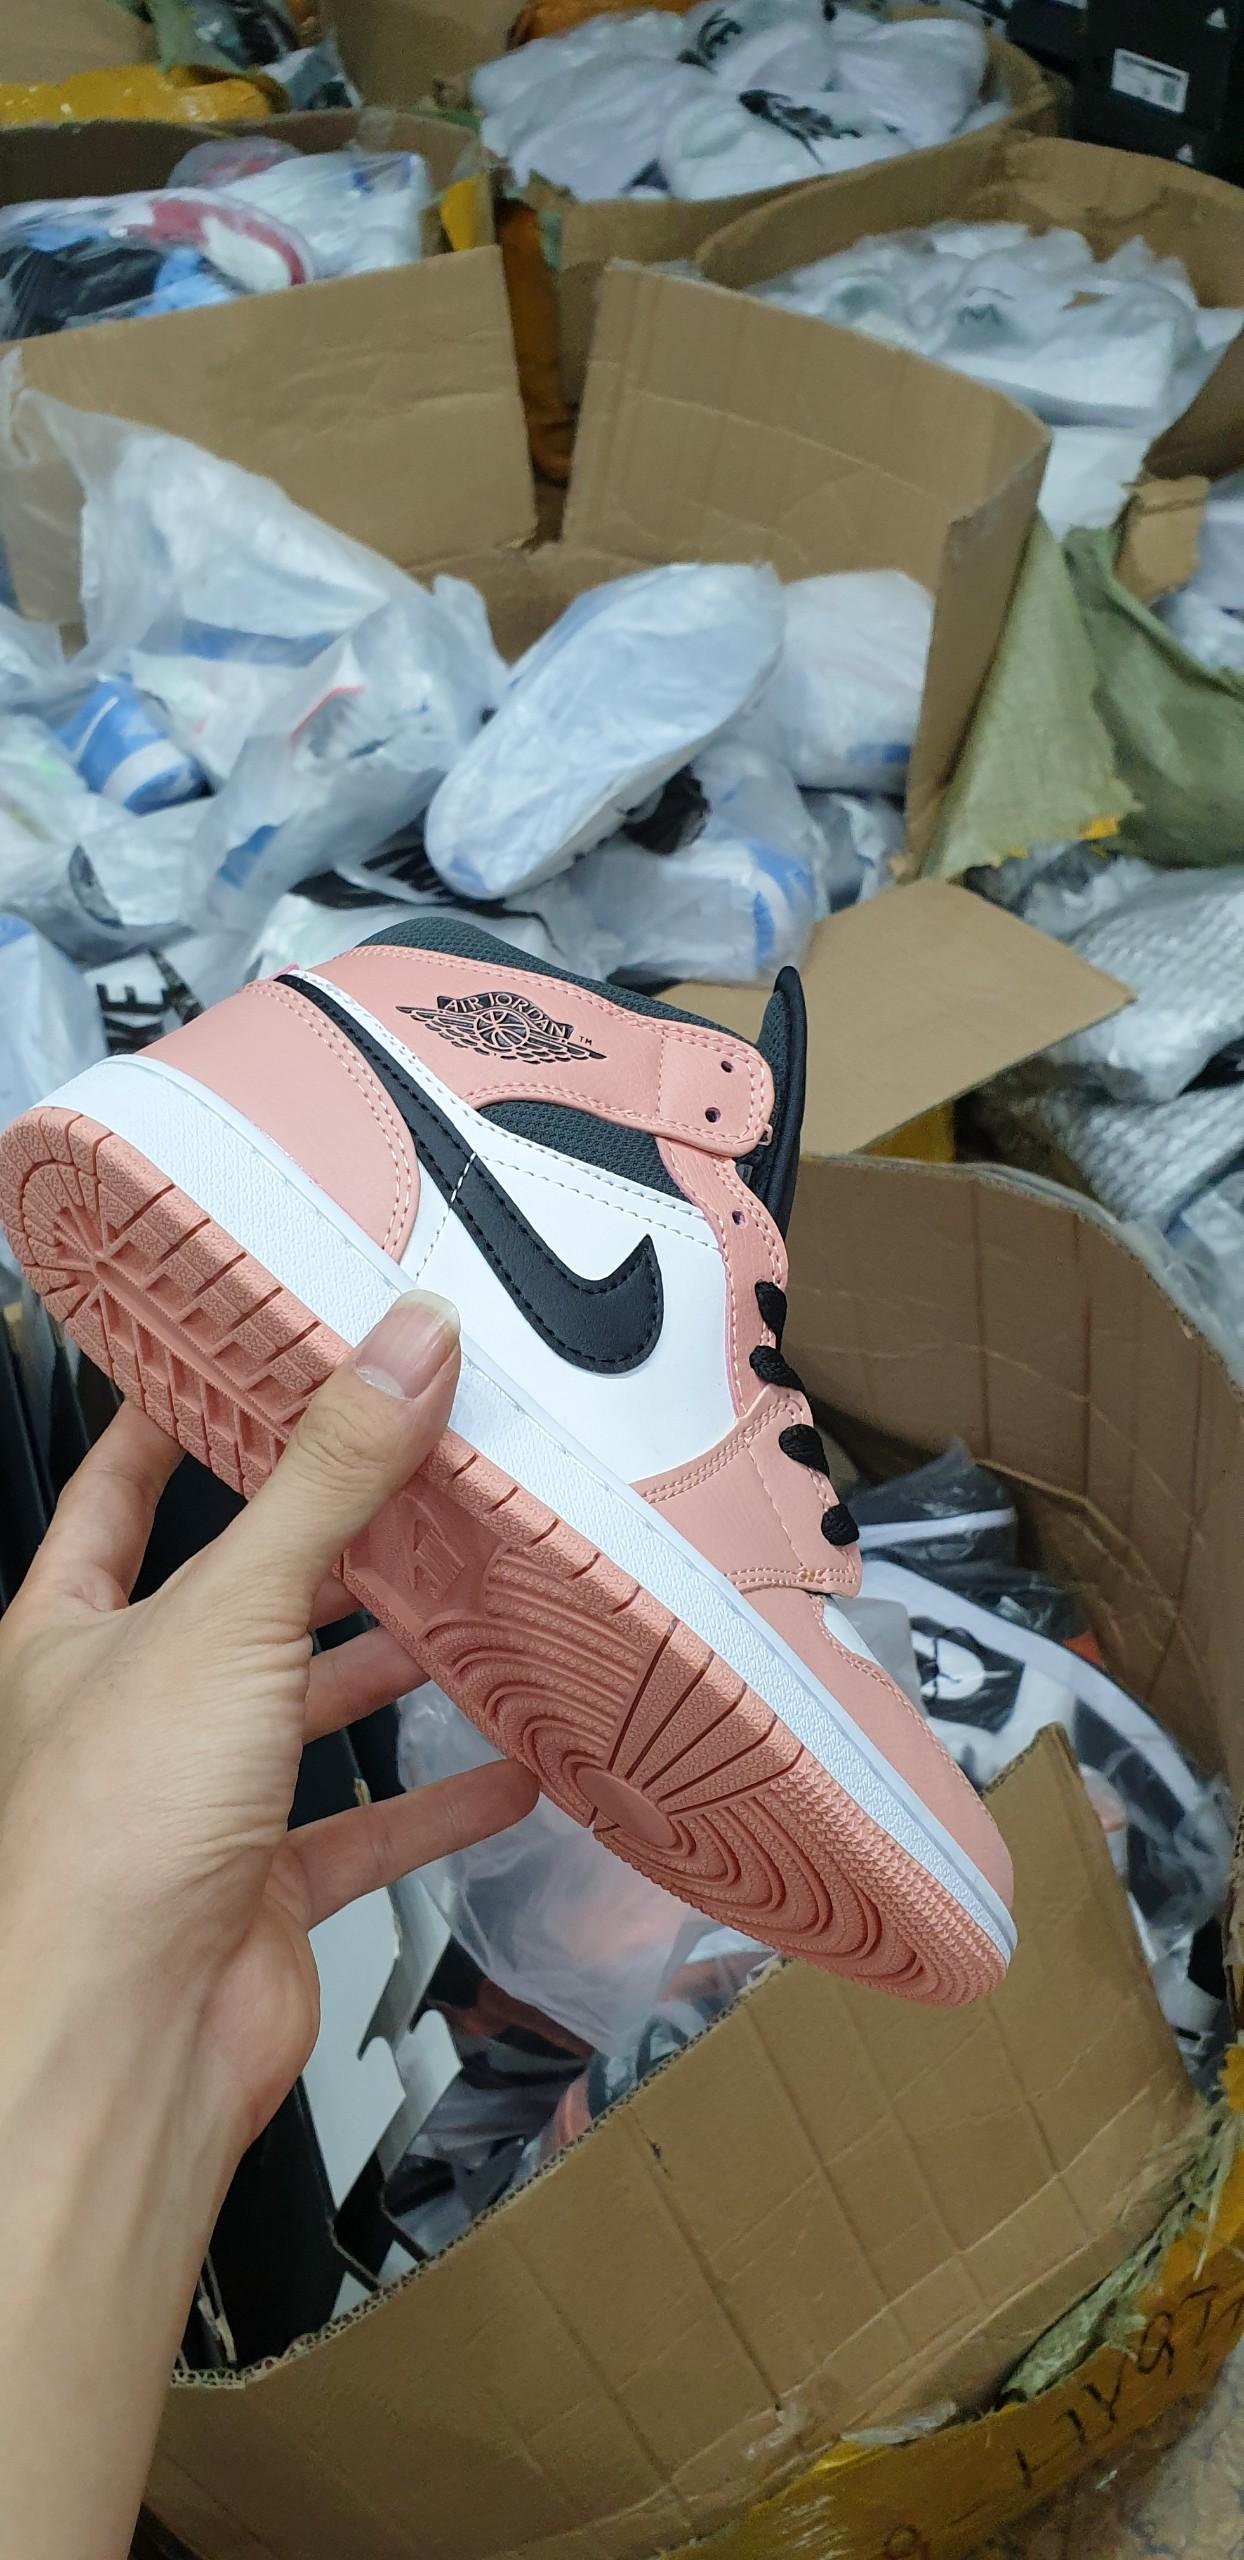 Giày Nike Air Jordan 1 Mid Hồng Pink Quartz Rep 1:1, Giày Nike Air Jordan 1 Mid Hồng Pink Quartz  SF, Giày Nike Air Jordan 1 Mid Hồng Pink Quartz  Super fake, Giày Nike Air Jordan 1 Mid Hồng Pink Quartz  f1, Giày Nike Air Jordan 1 Mid Hồng Pink Quartz  Replica, Giày Nike Air Jordan 1 Mid Hồng Pink Quartz Rep